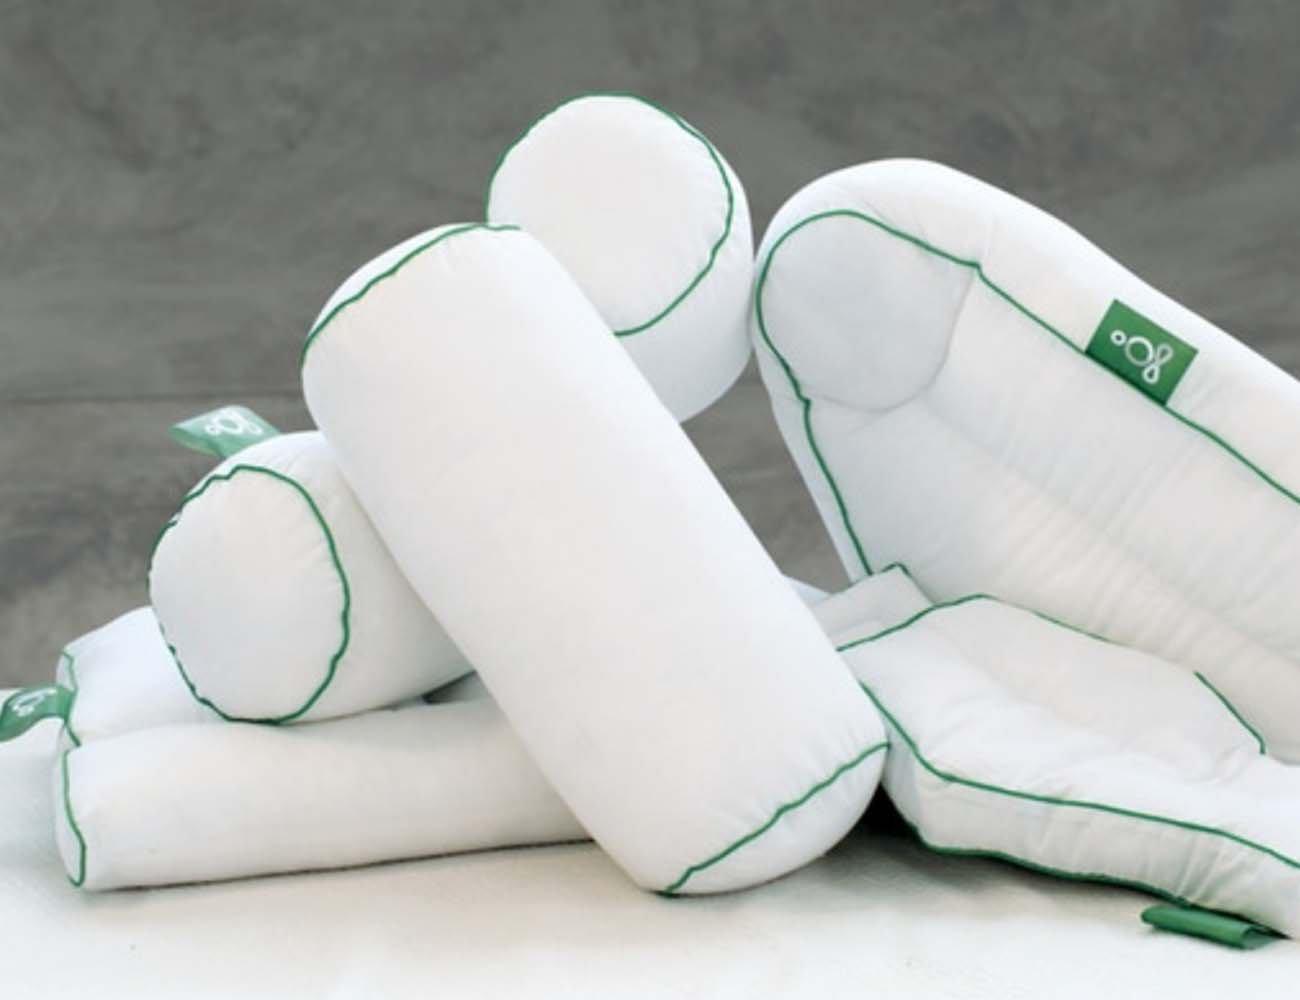 10 Sleep tech gadgets to help you get some shuteye - Sleep Yoga 03